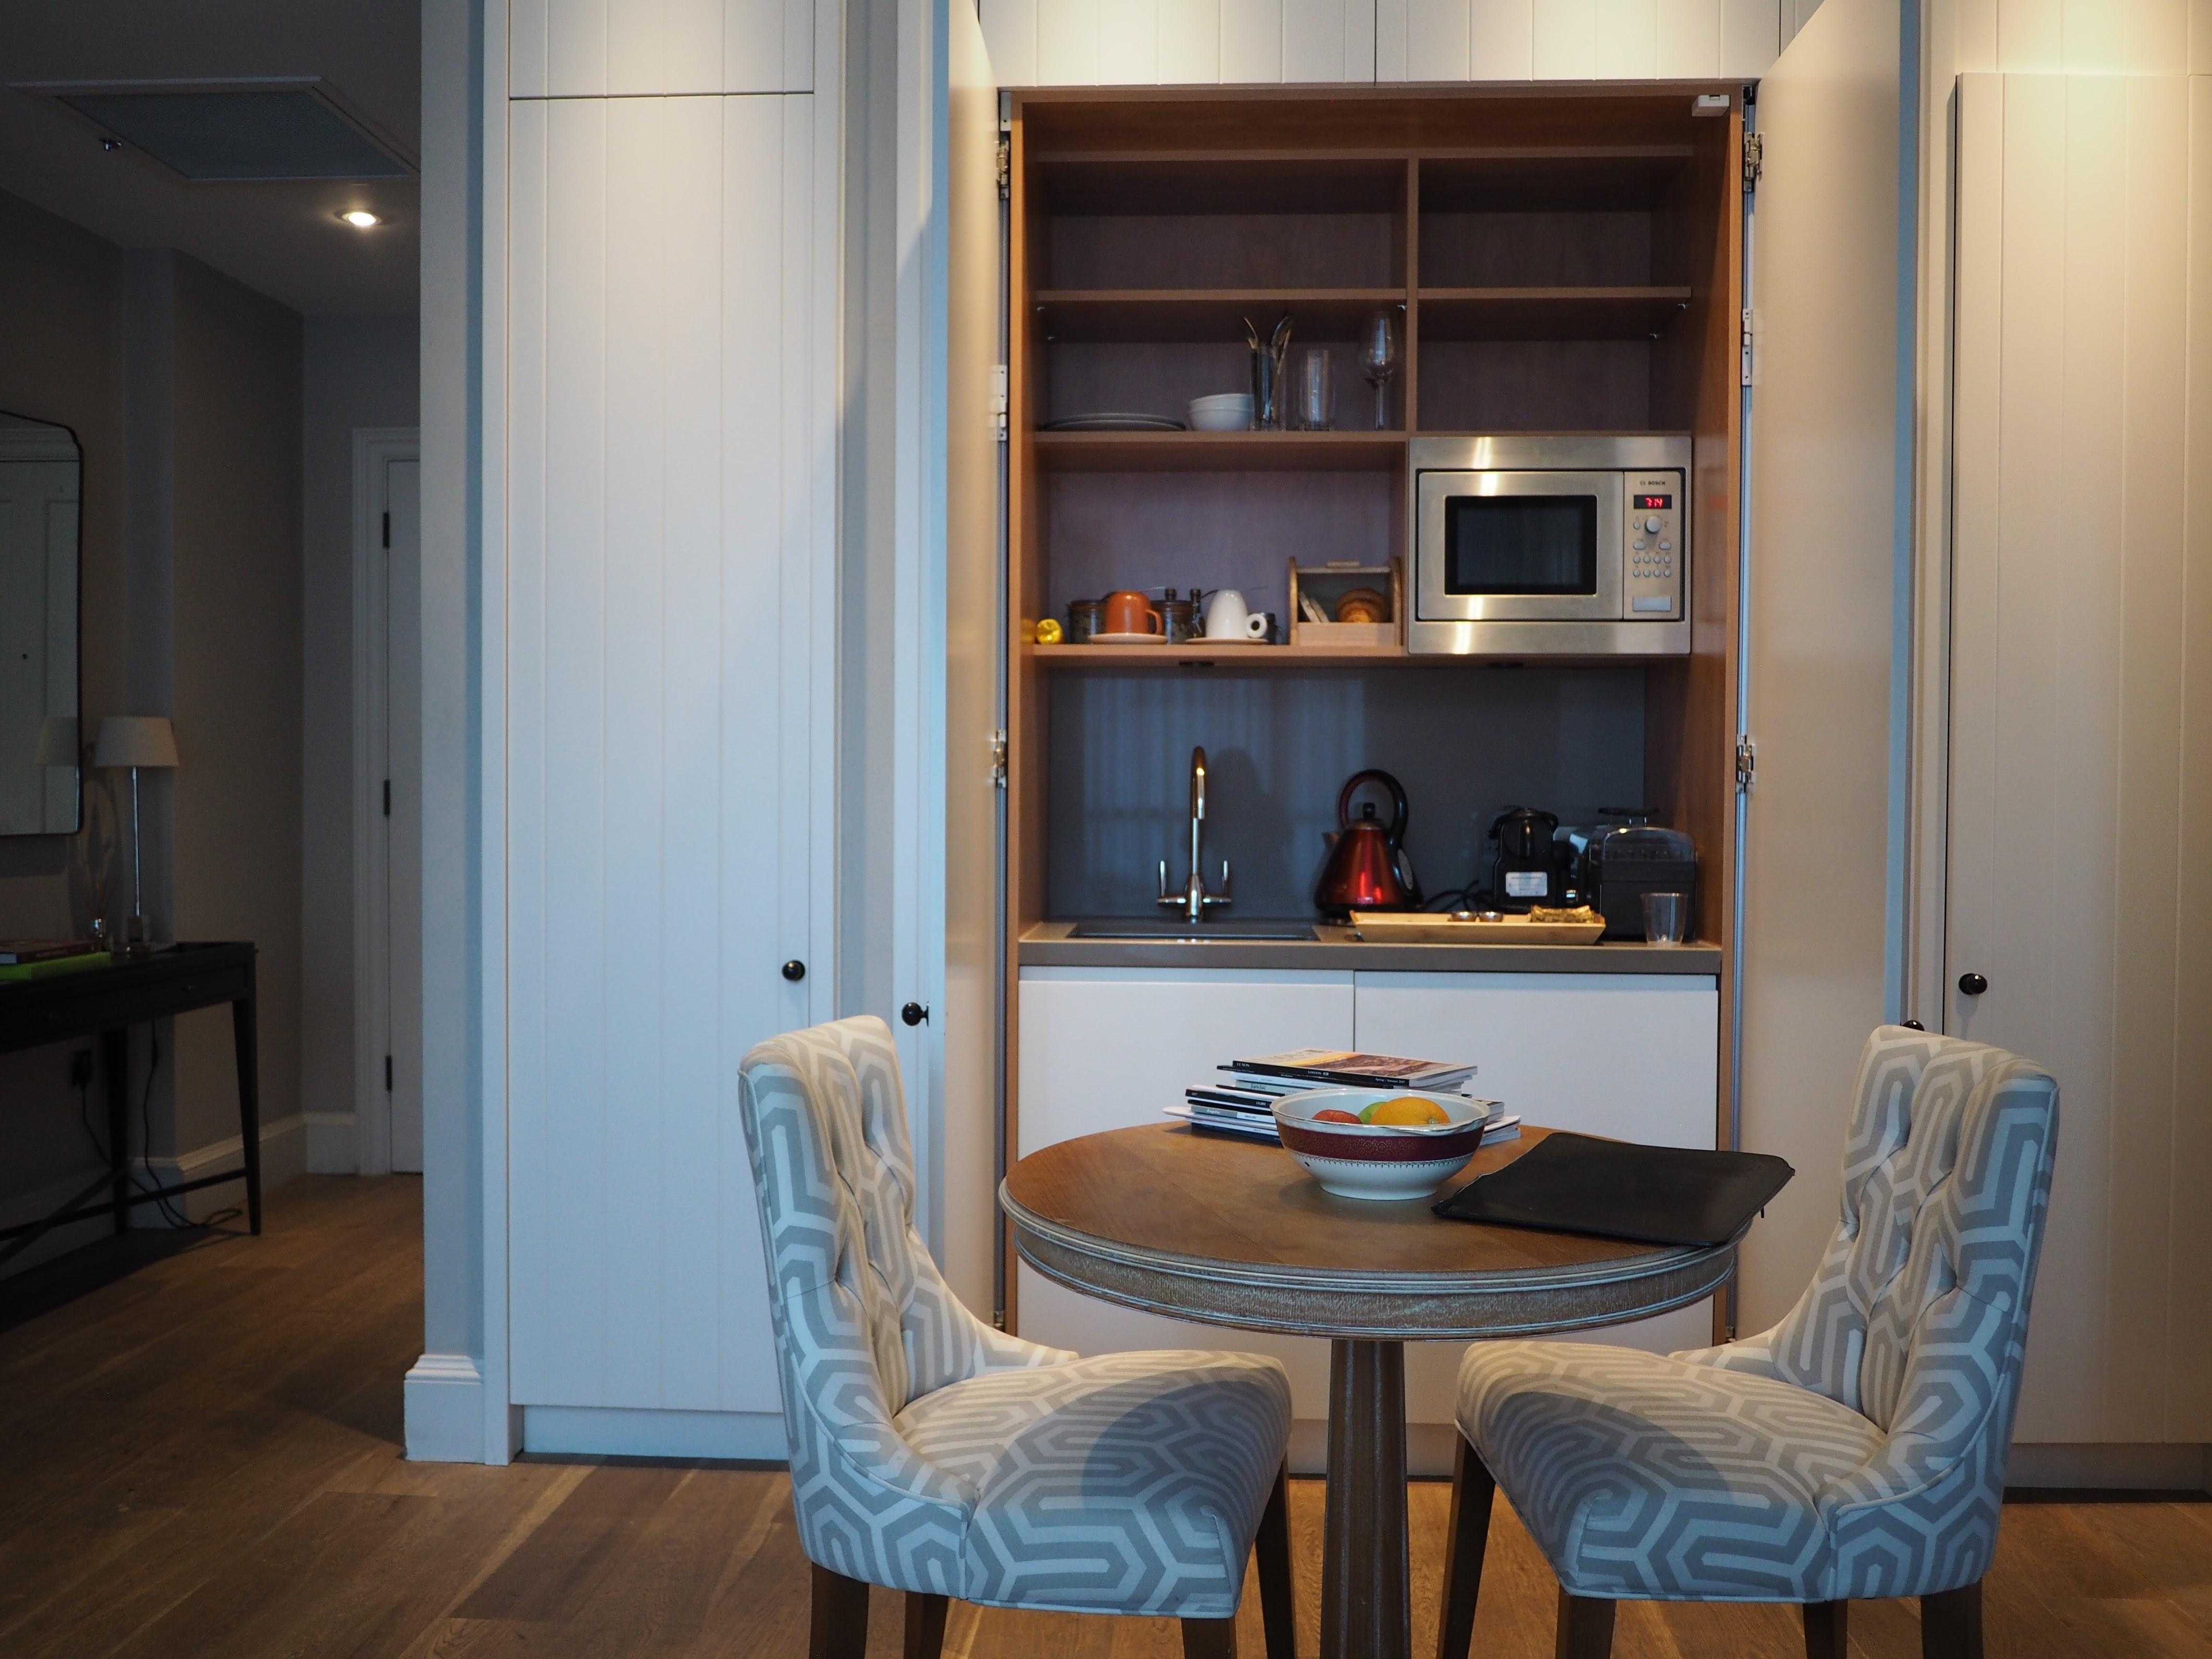 Luxury Hotels St Martins Lane Covent Garden